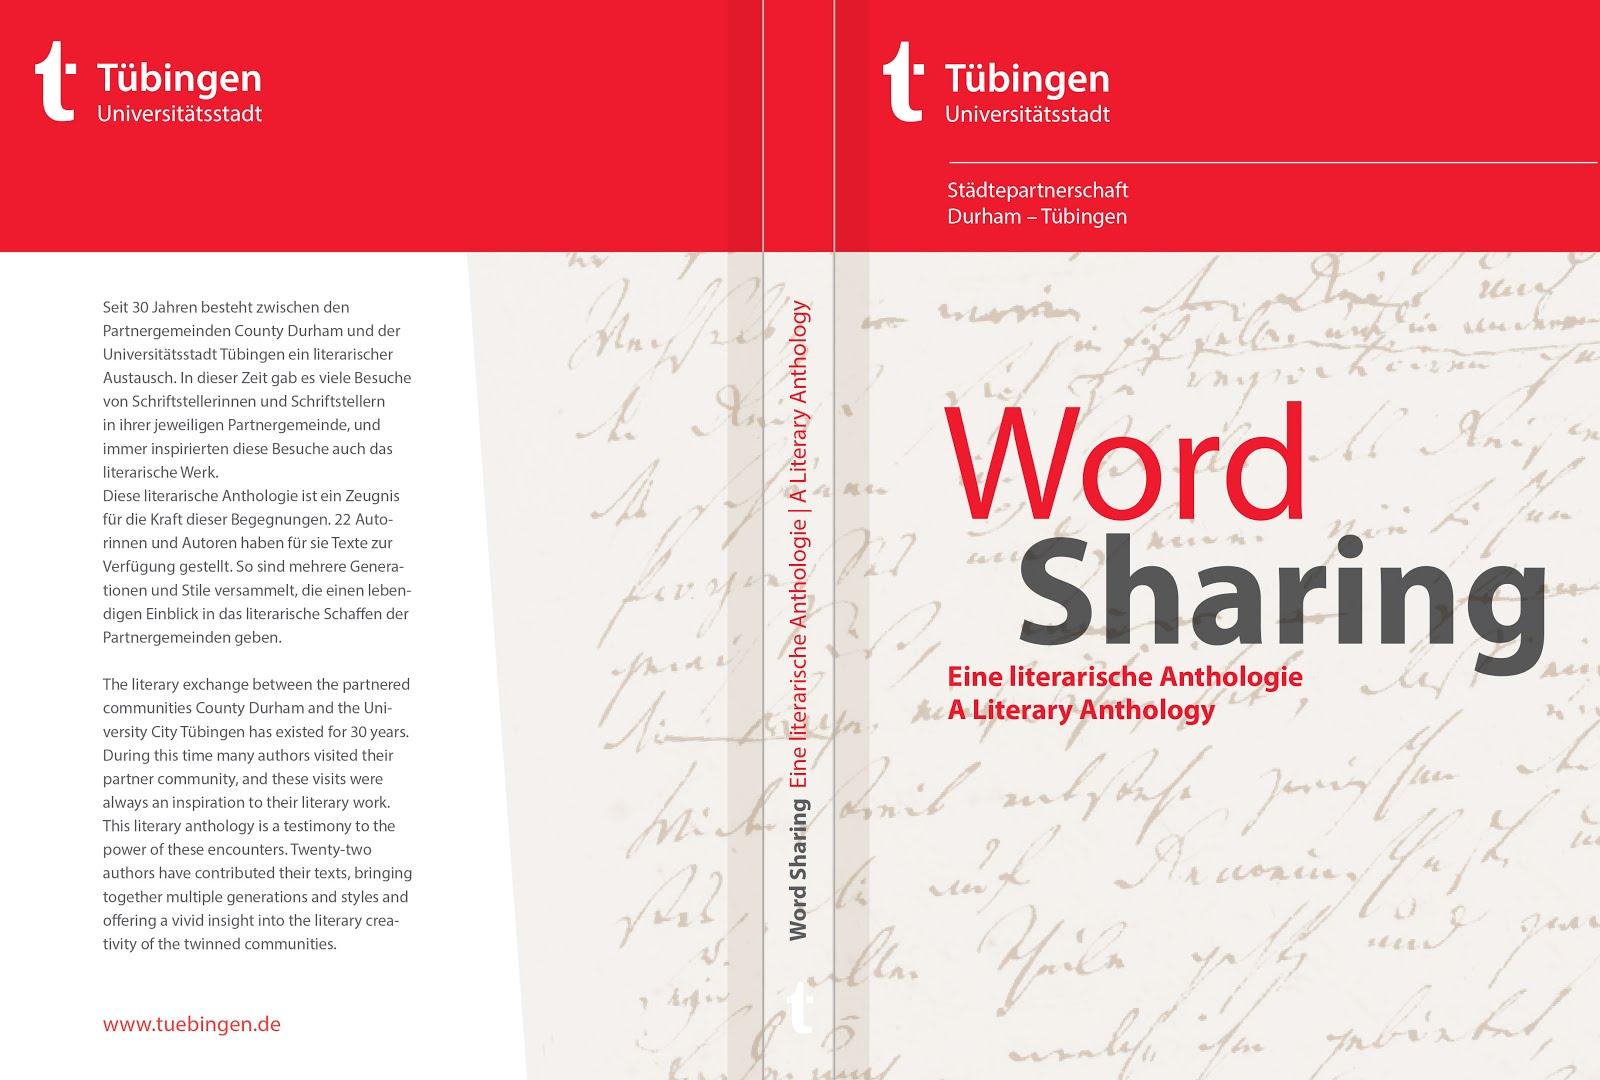 WORD SHARING!